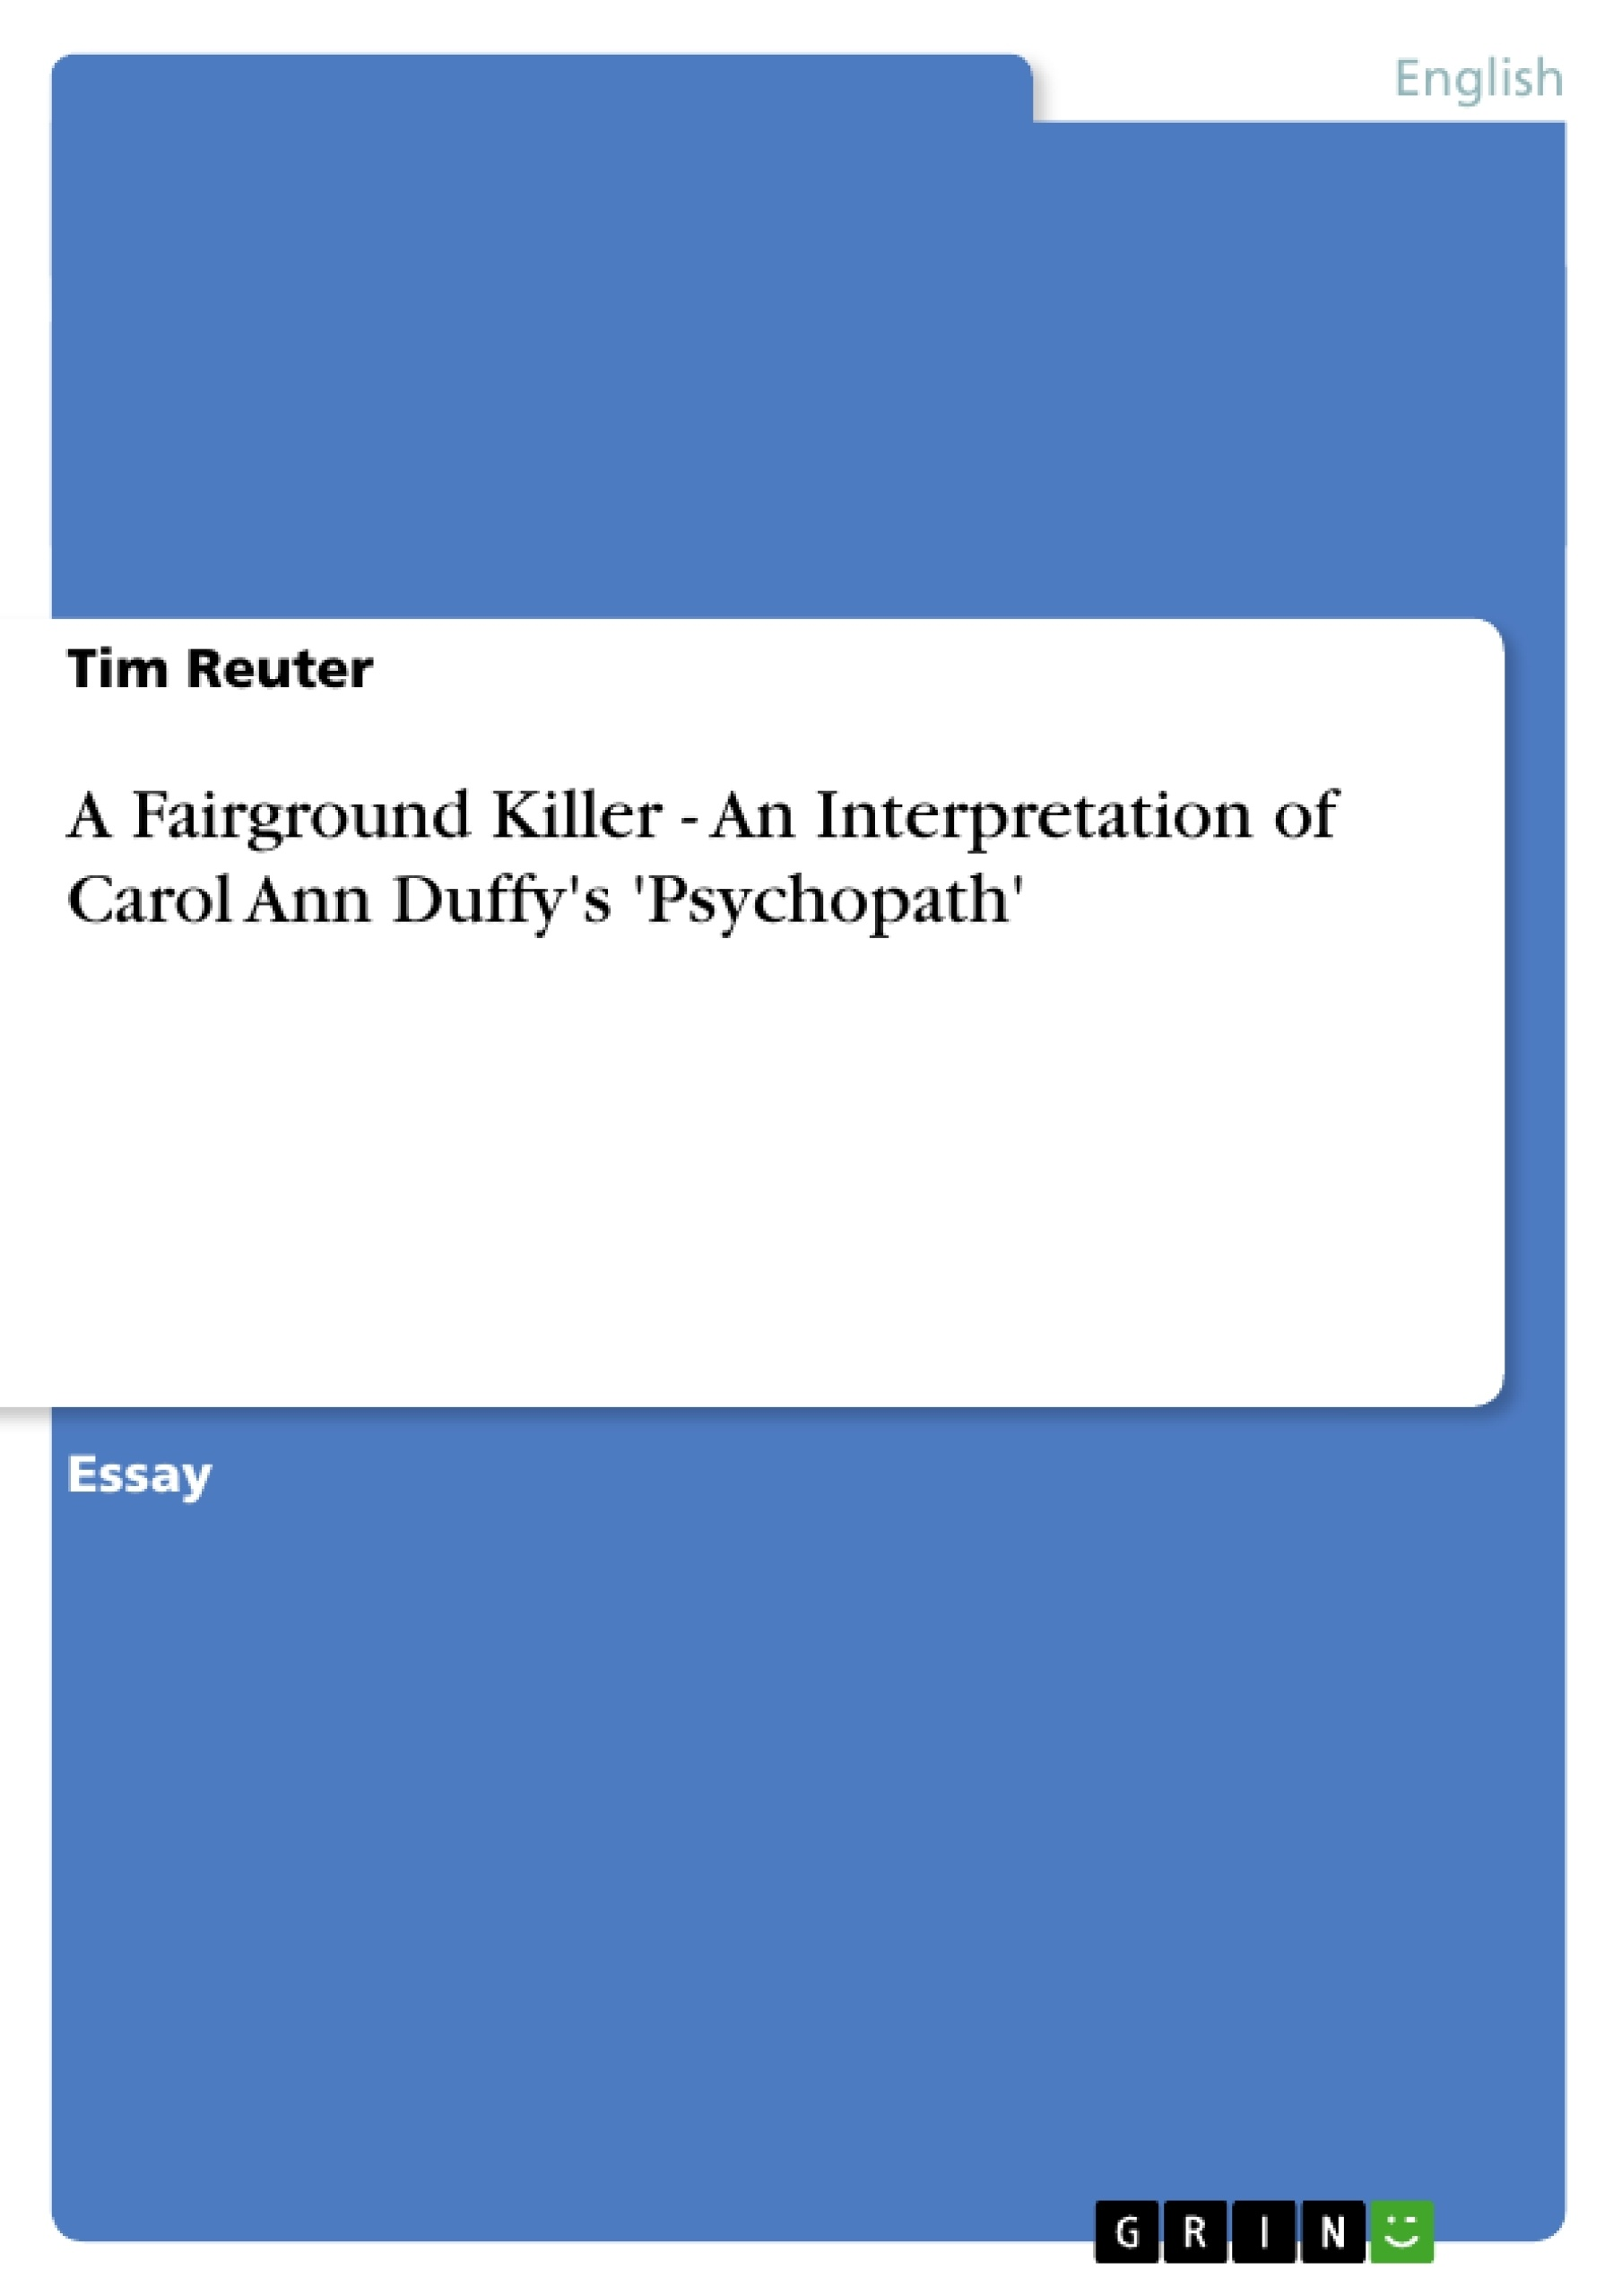 Title: A Fairground Killer - An Interpretation of Carol Ann Duffy's 'Psychopath'